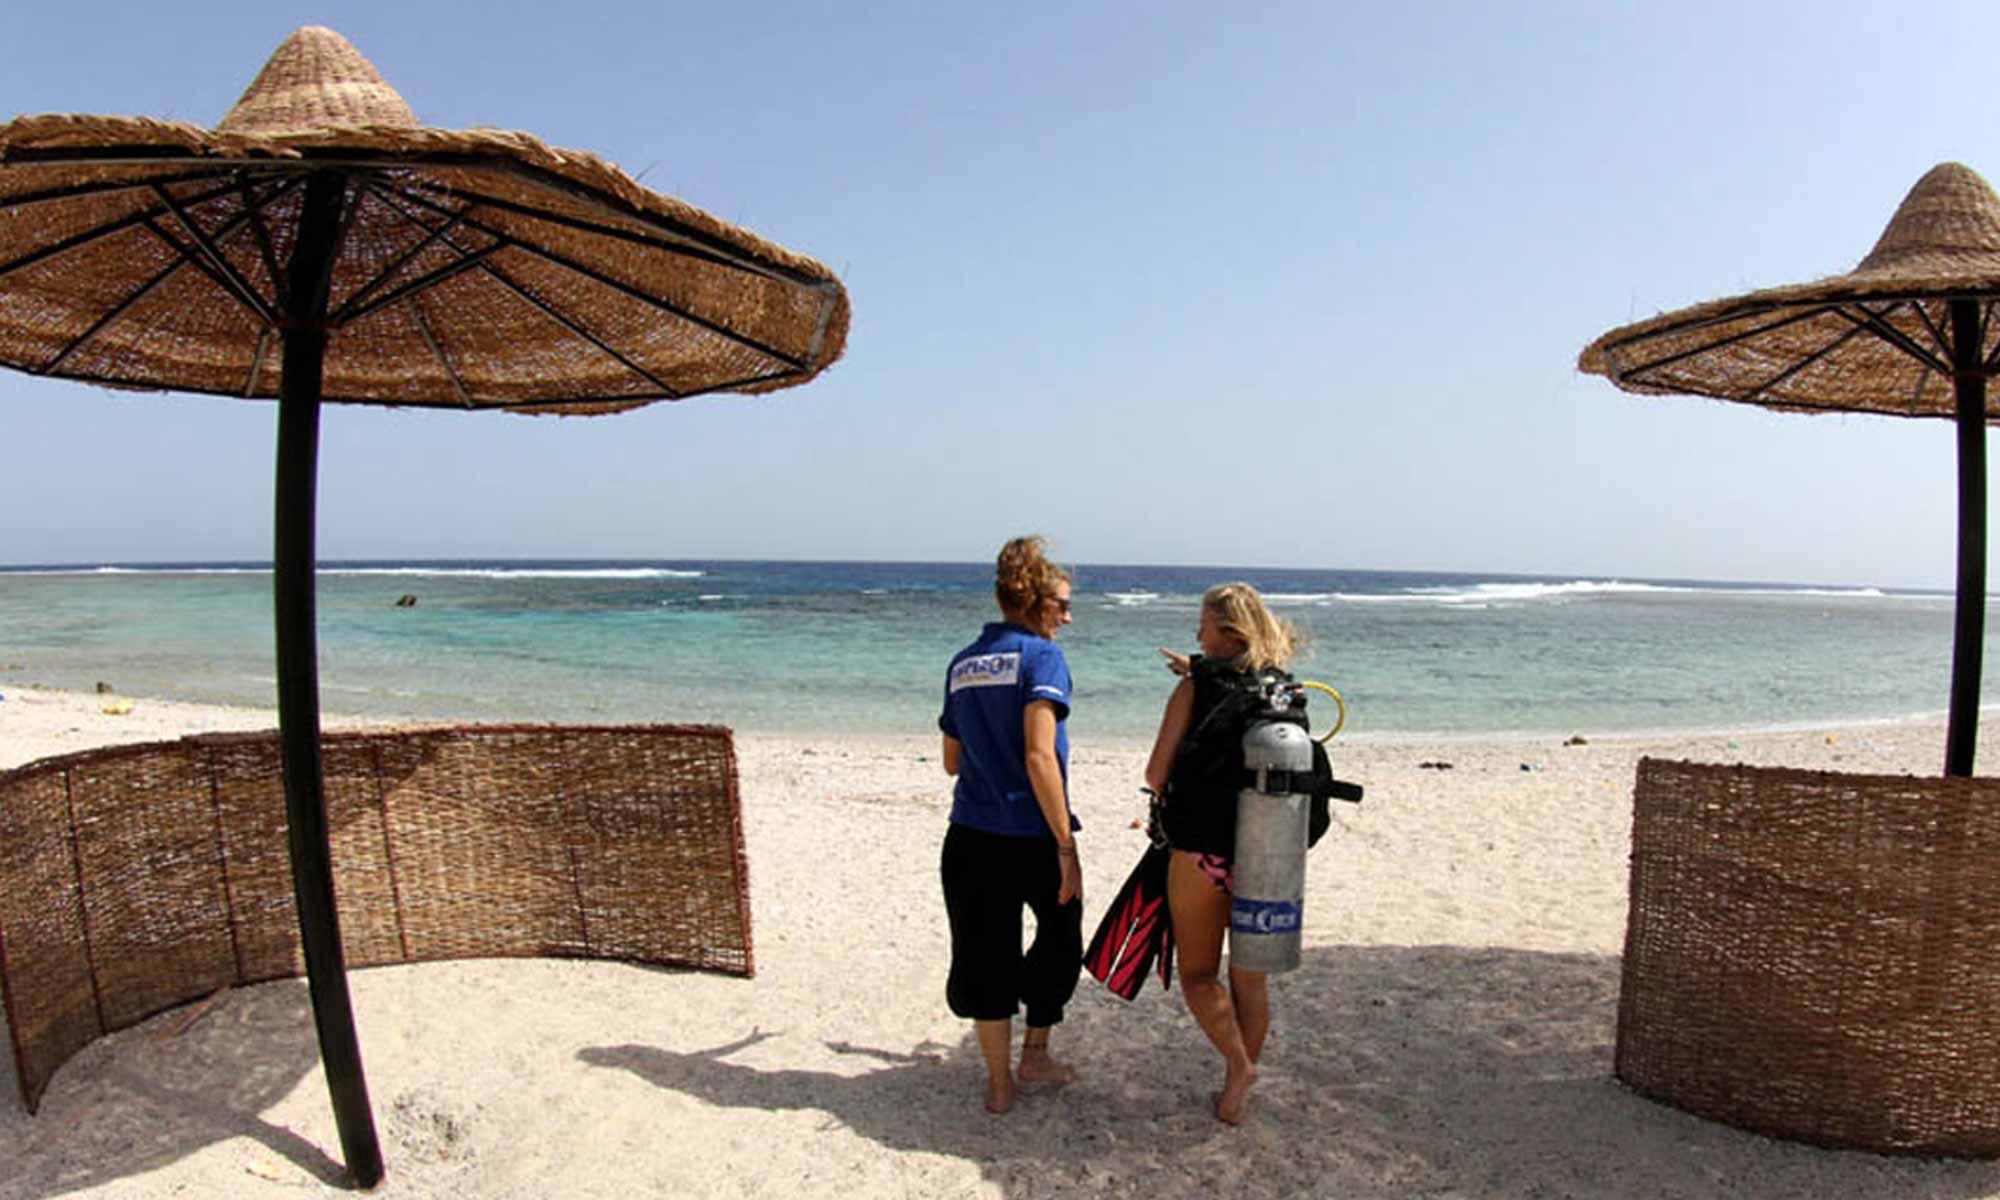 Slow Dive Rotes Meer Ägypten Emperor Divers Marsa Alam Strand Tauchen